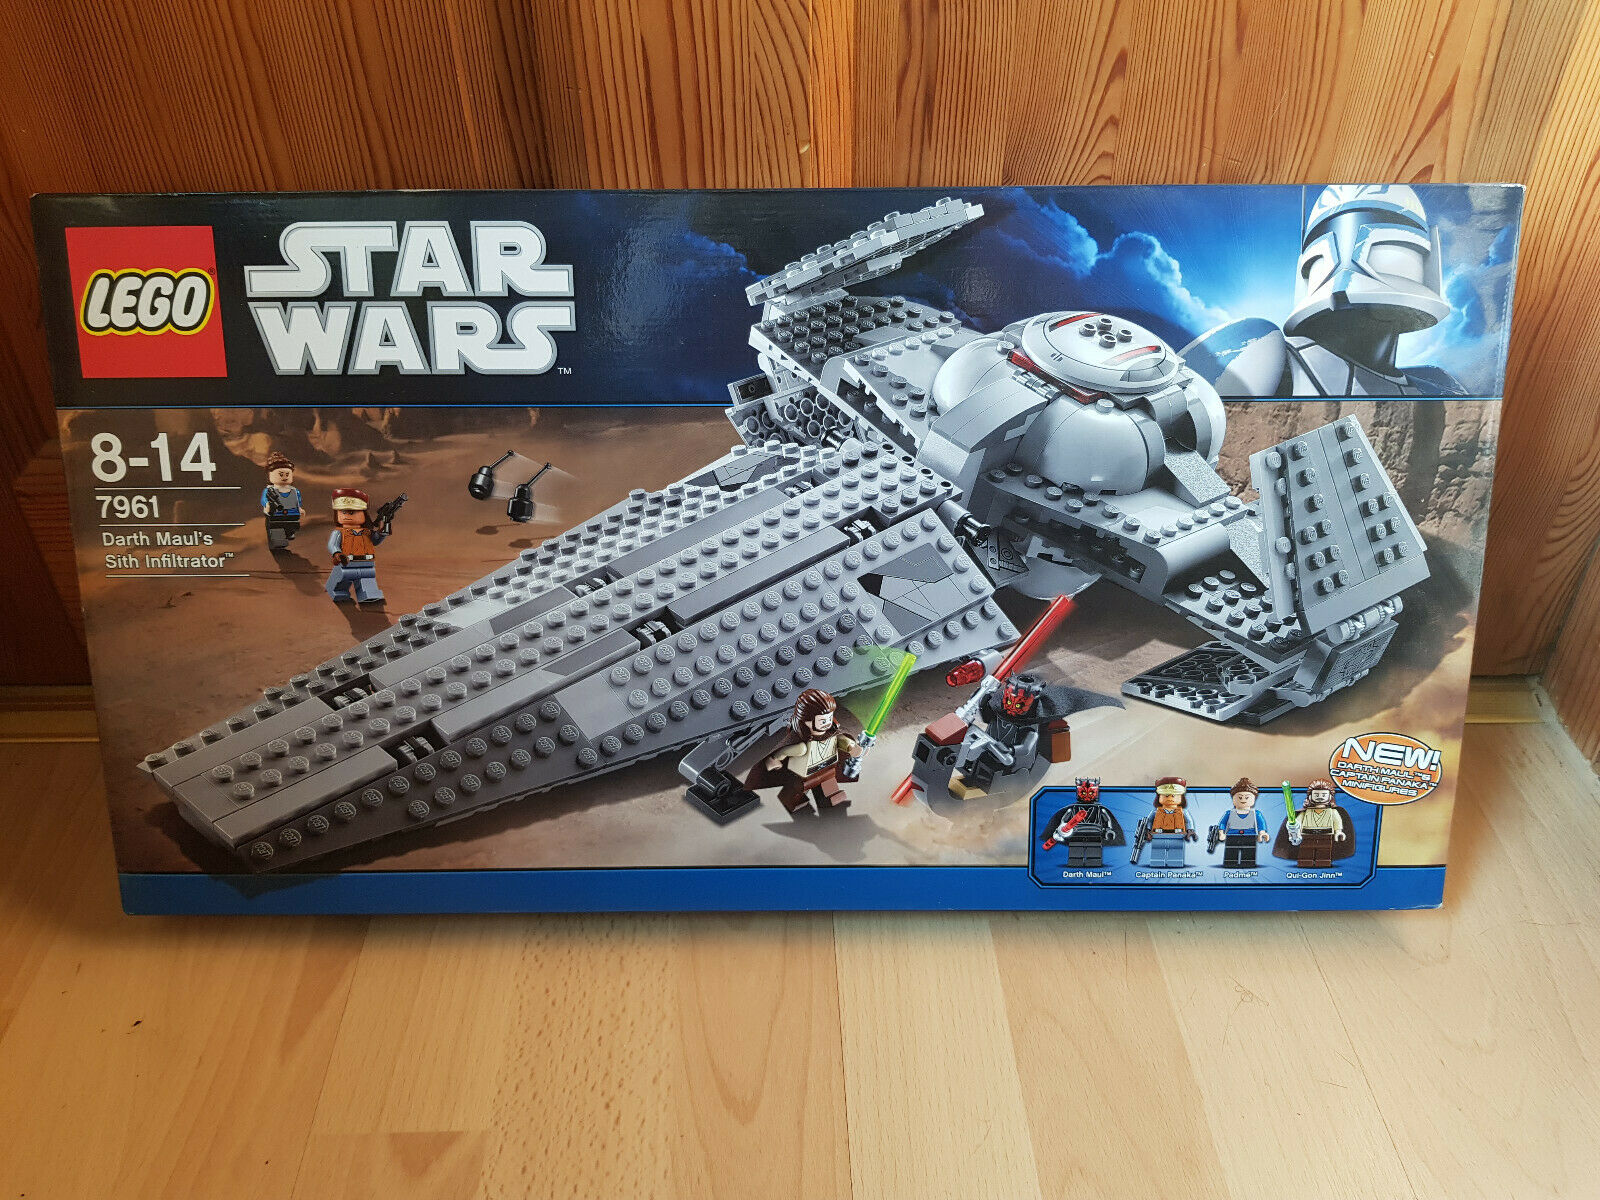 Lego Star Wars 7961  Darth Maul's Sith Infiltrator   NEU & ungeöffnet